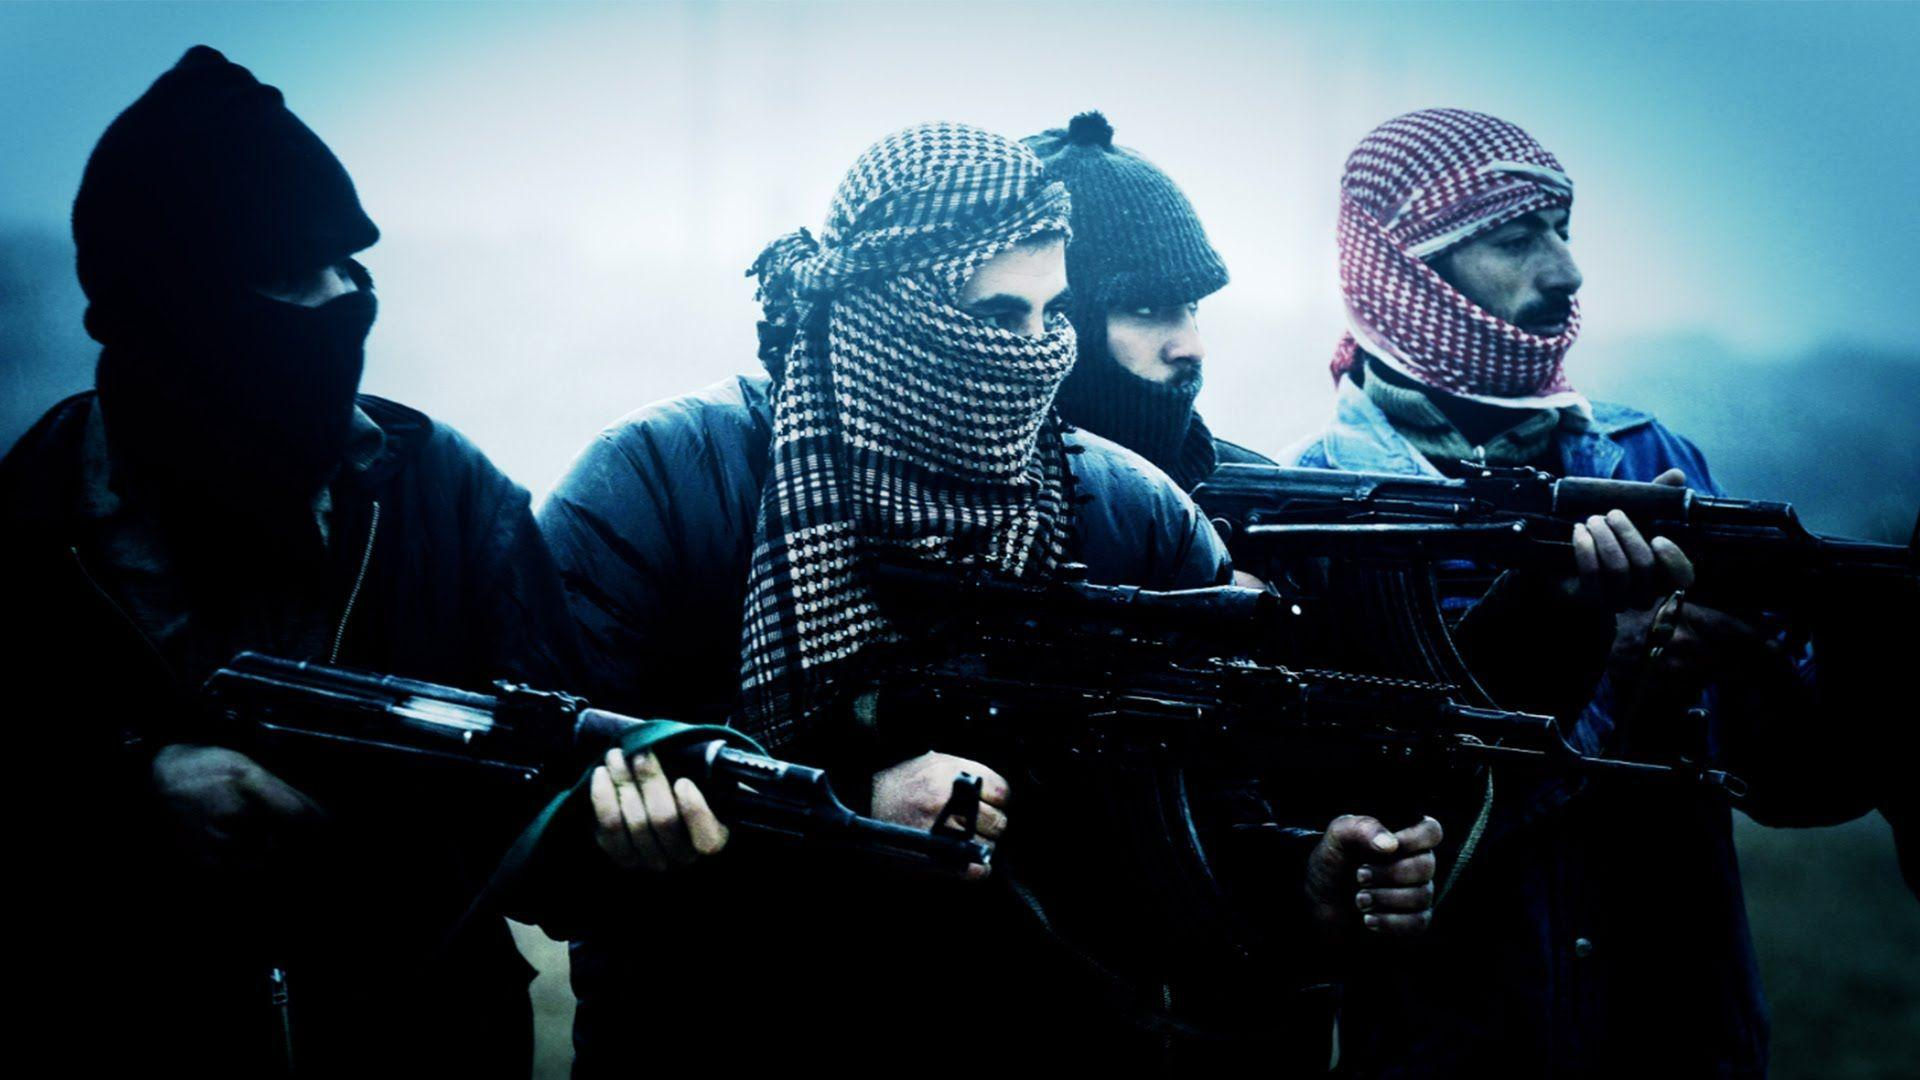 Turkey 'Neutralizes' 8 PKK Militants in Northern Iraq - Reports